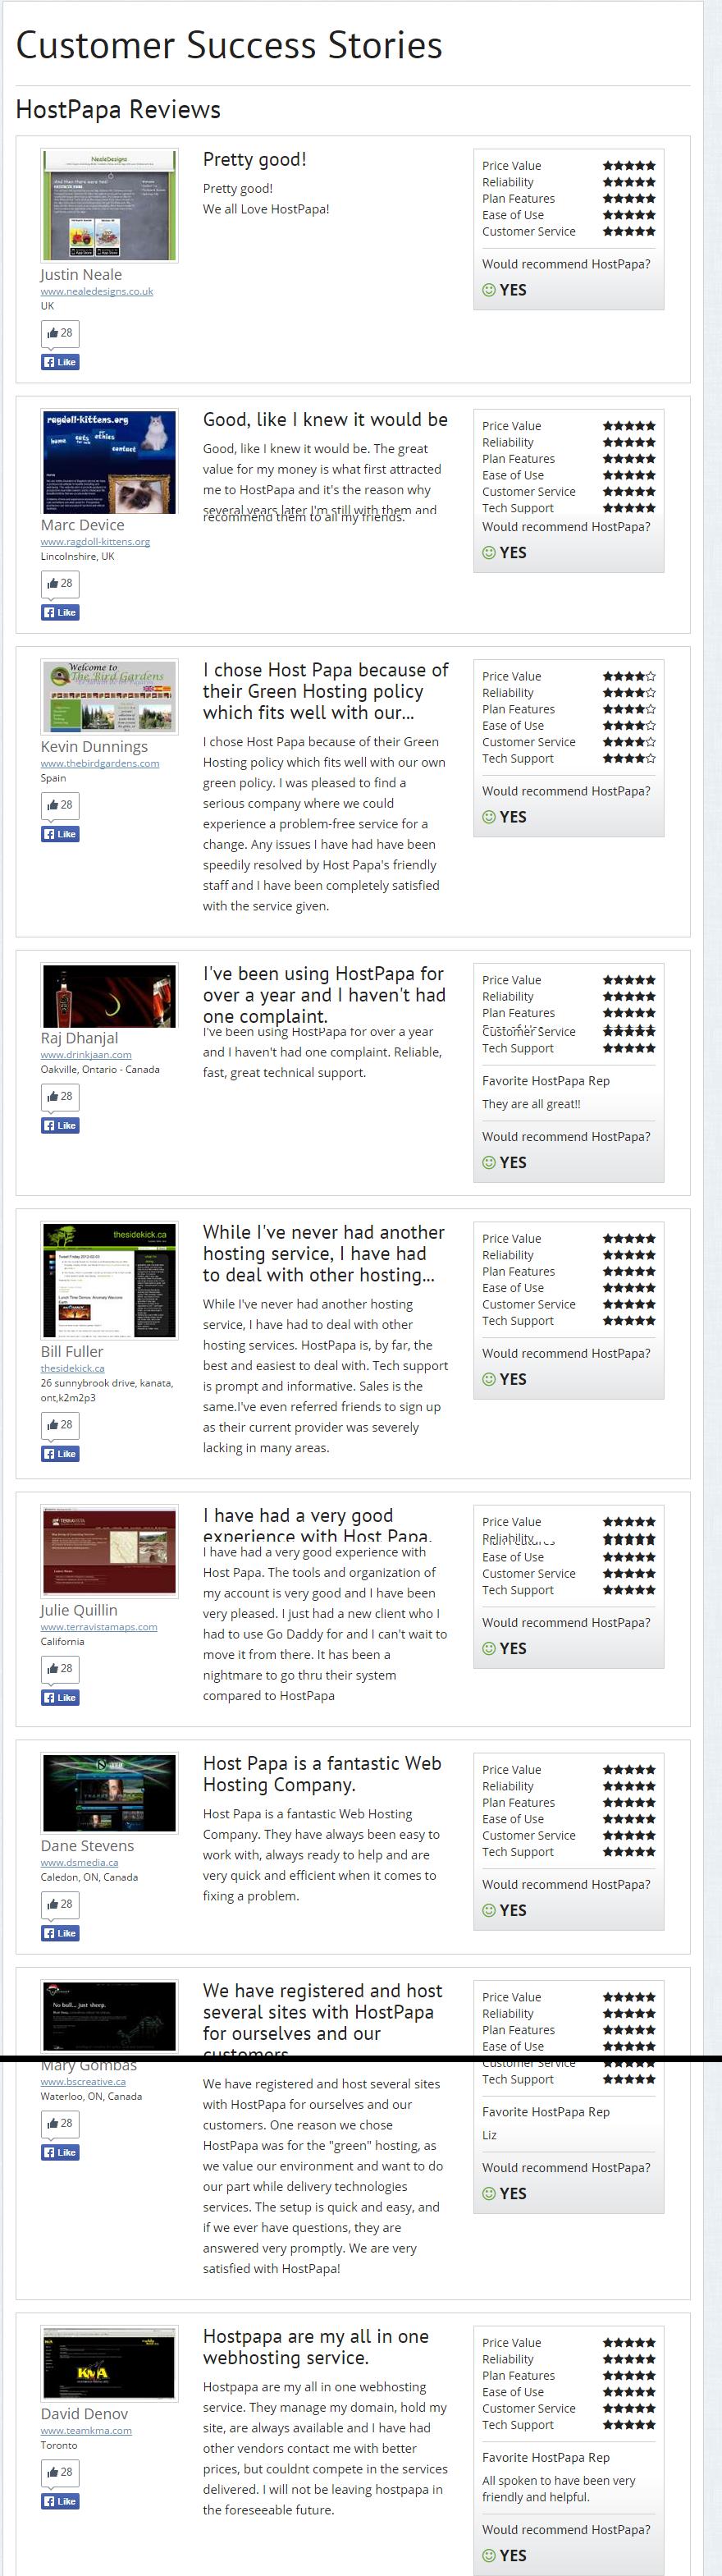 HostPapa Customer Success Stories